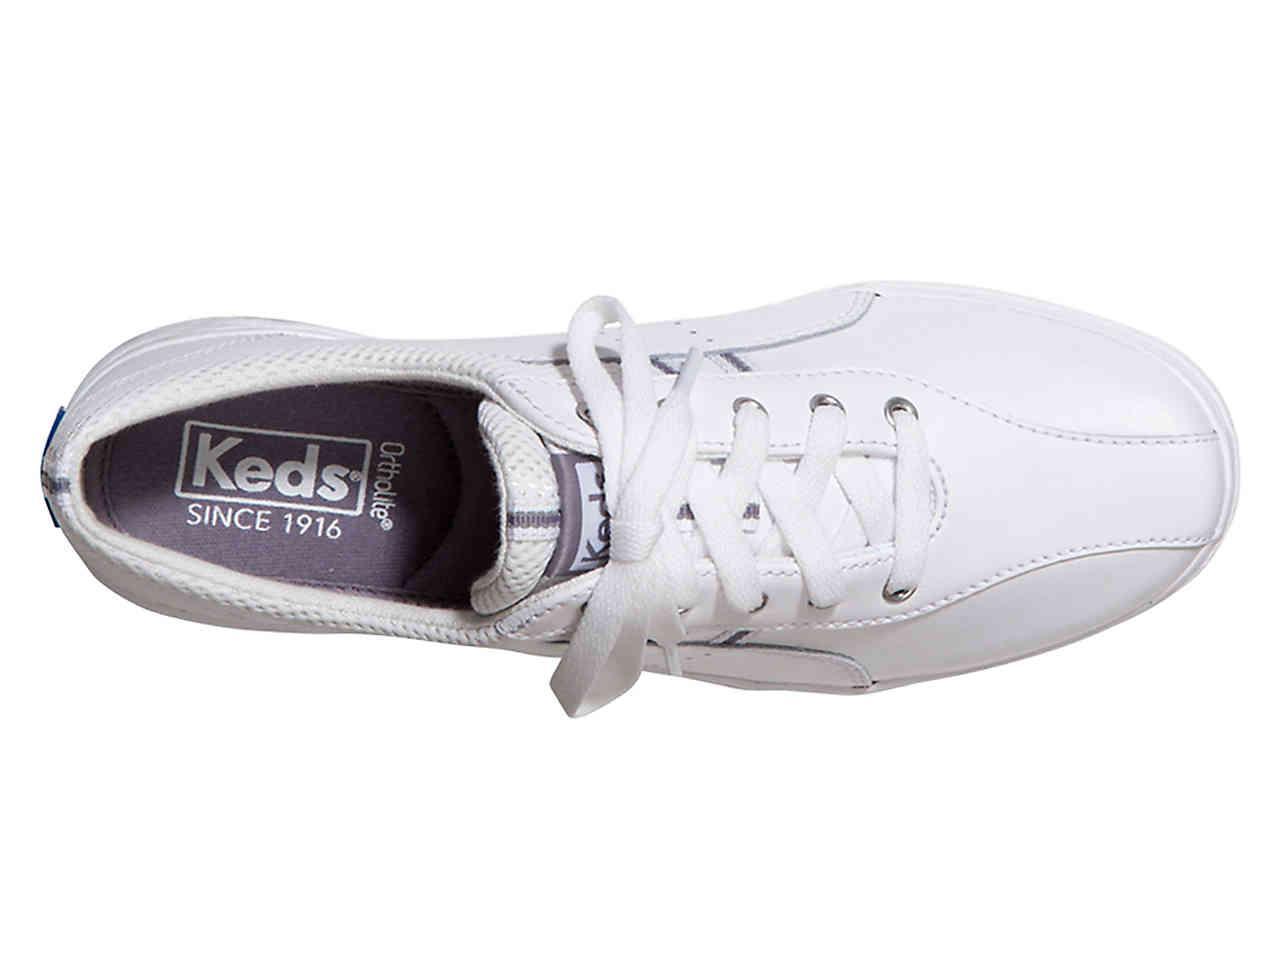 Keds Leather Spirit Ii Sneaker in White